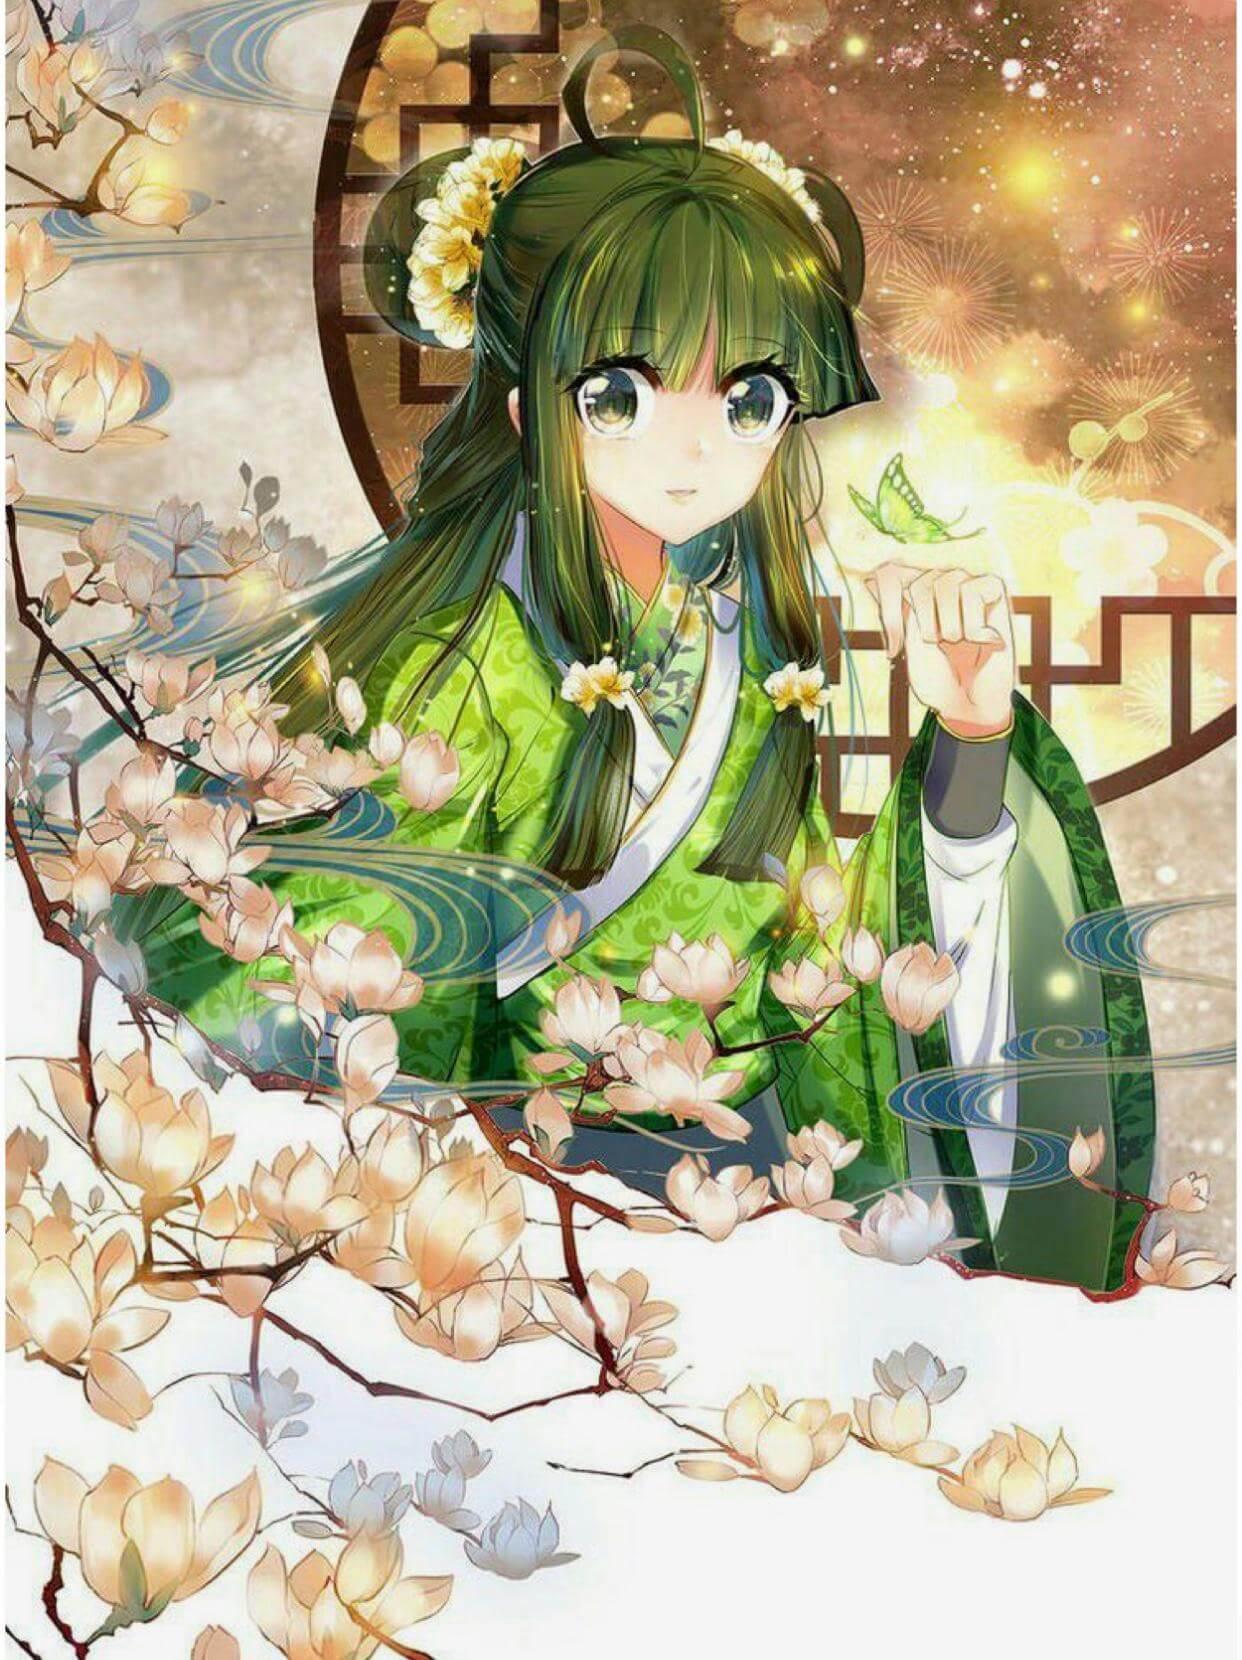 Anime girl tóc xanh lá cổ trang